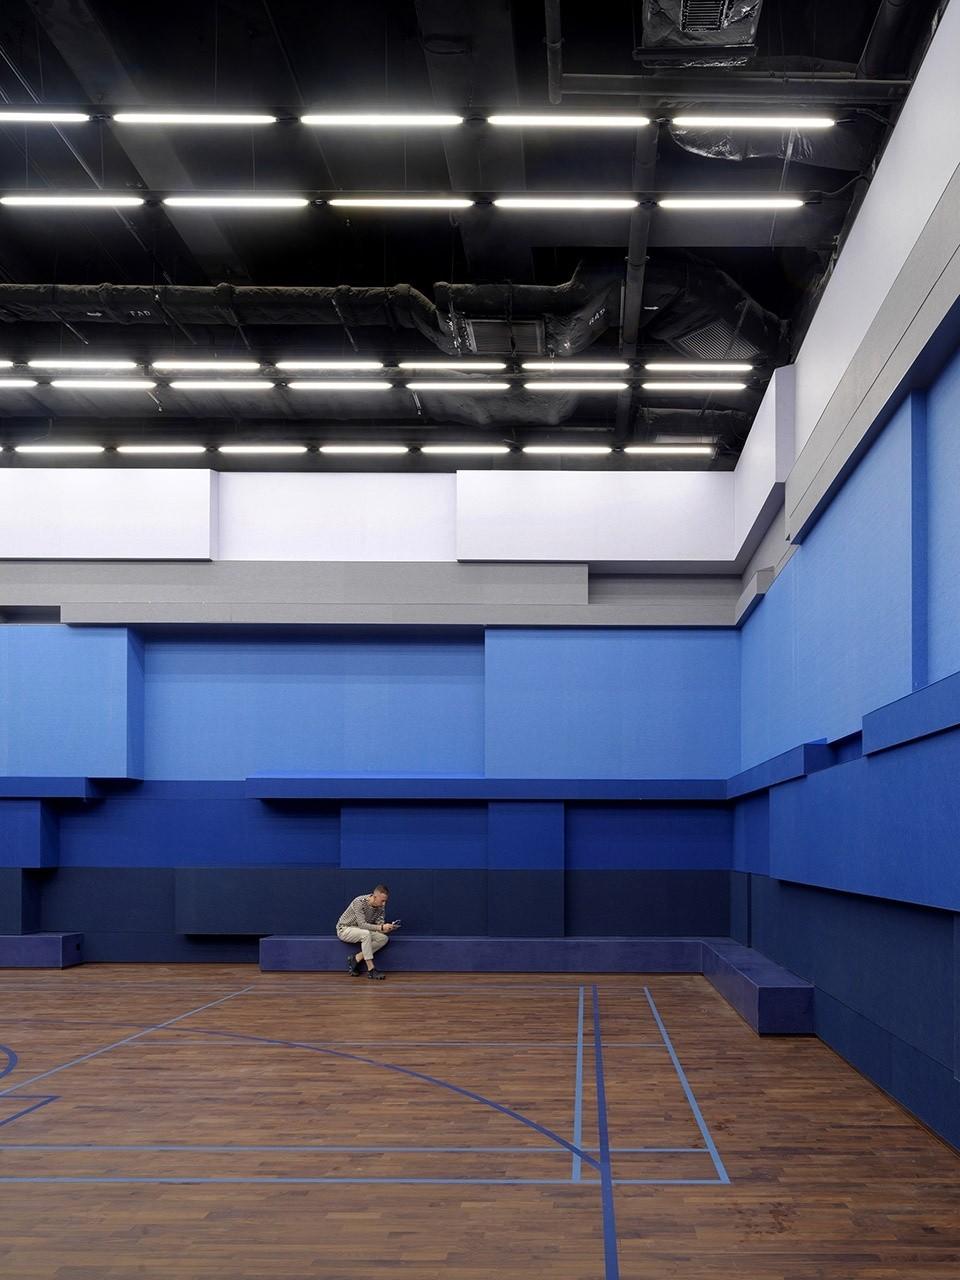 014-tseung-kwan-o-alto-residences-clubhouse-china-by-one-plus-partnership-960x1280.jpg